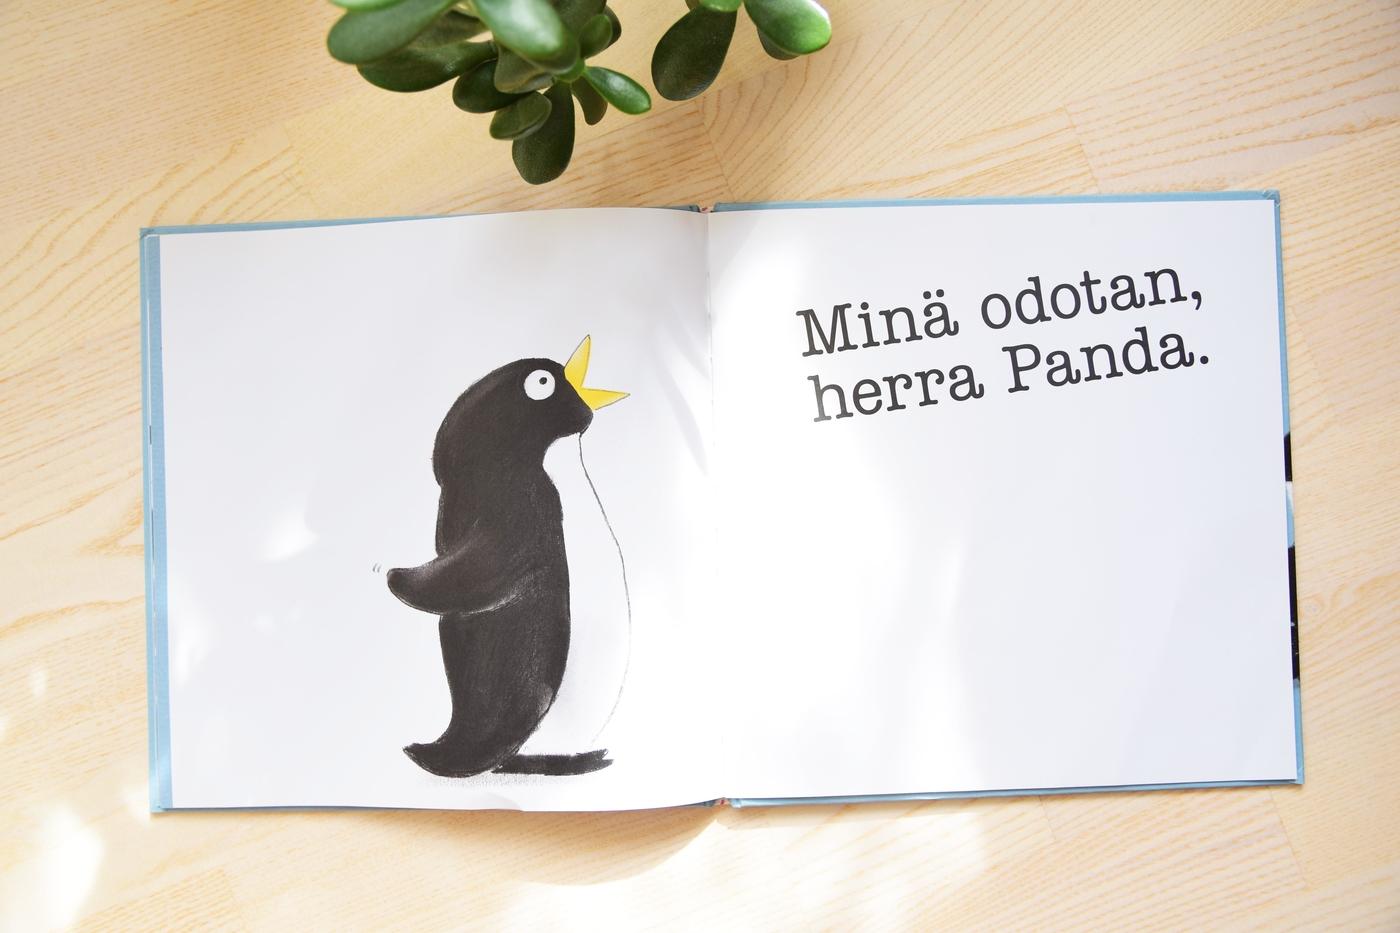 herra panda leipoo8.jpg